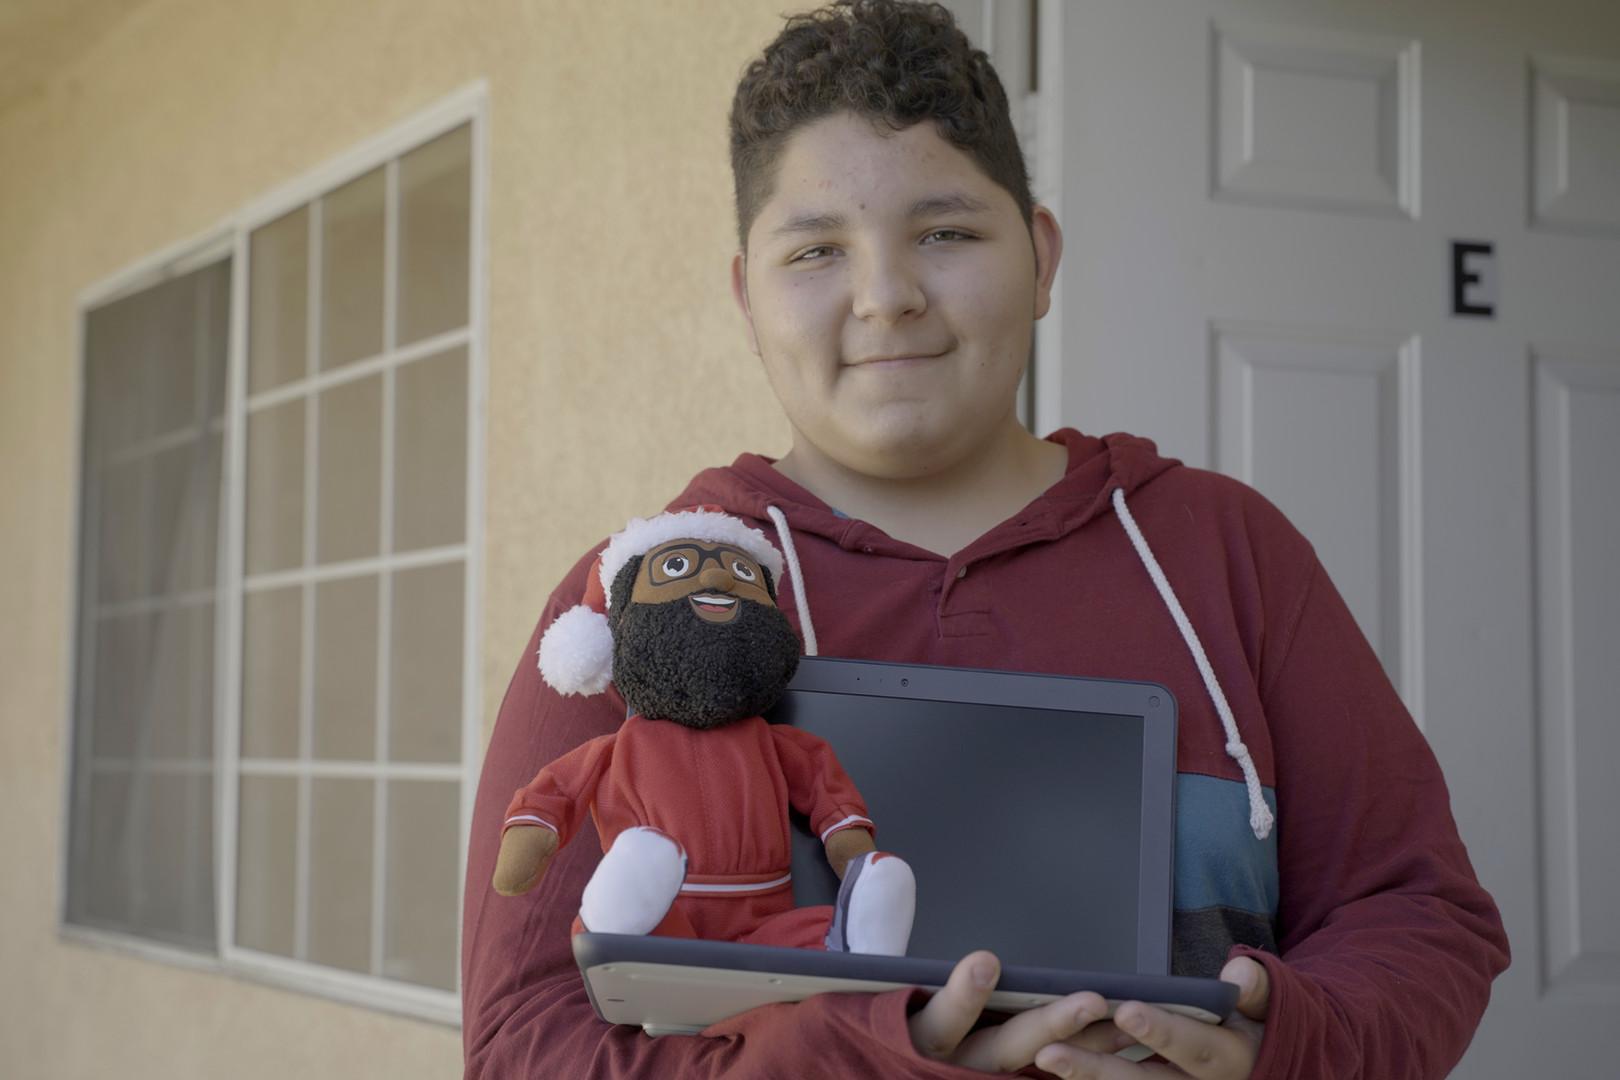 Julian receives his Chromebook from the Black Santa crew